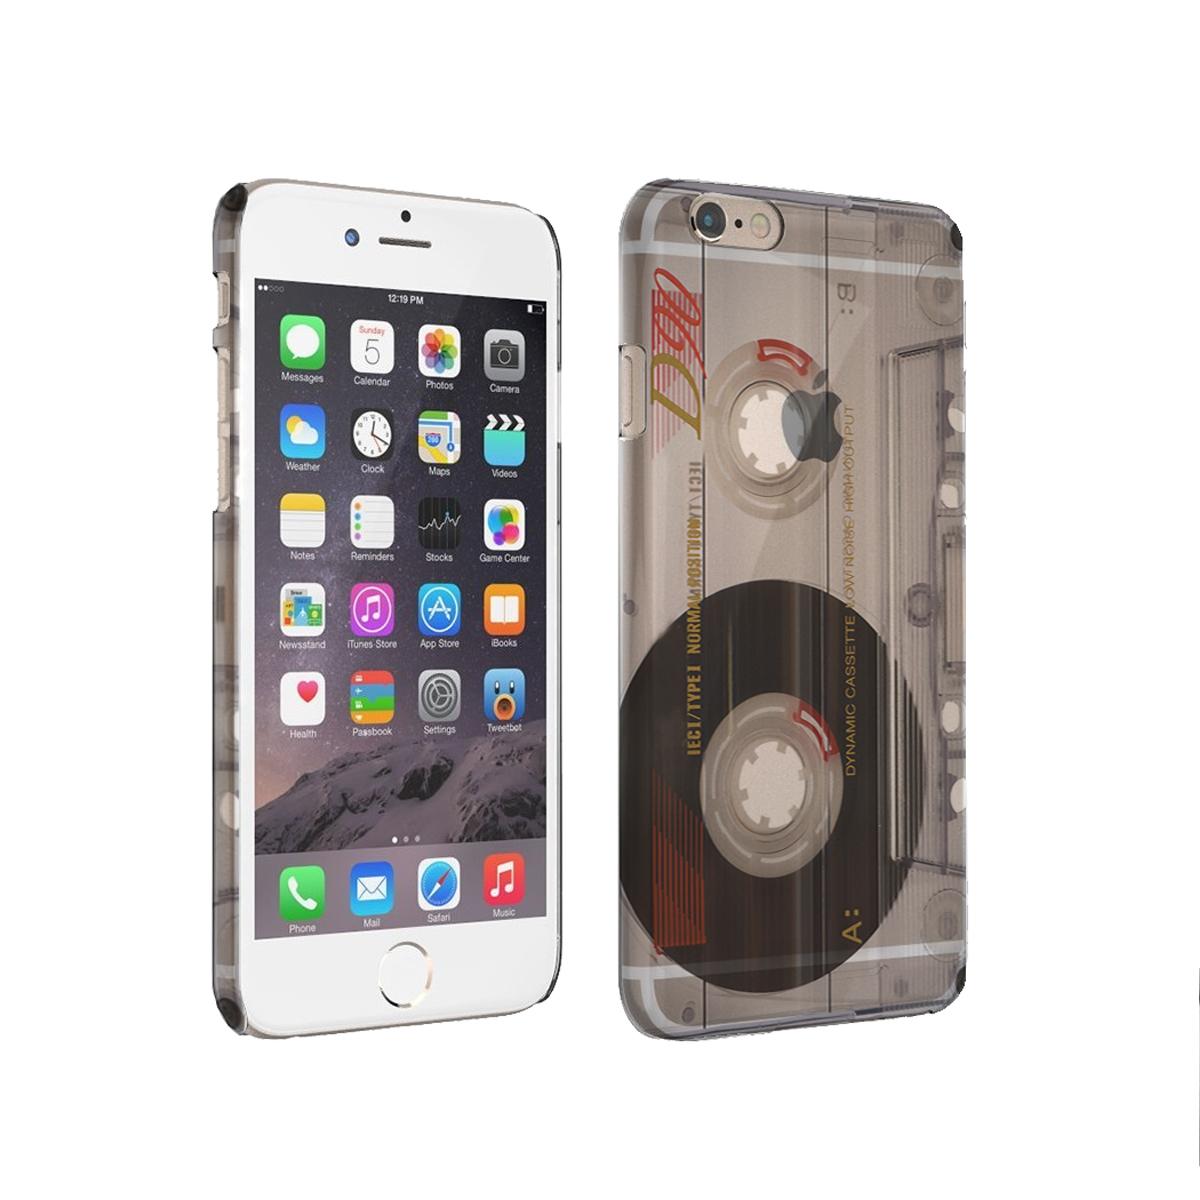 KuzmarK iPhone 6 Plus Clear Cover Case - Old School Cassette Tape